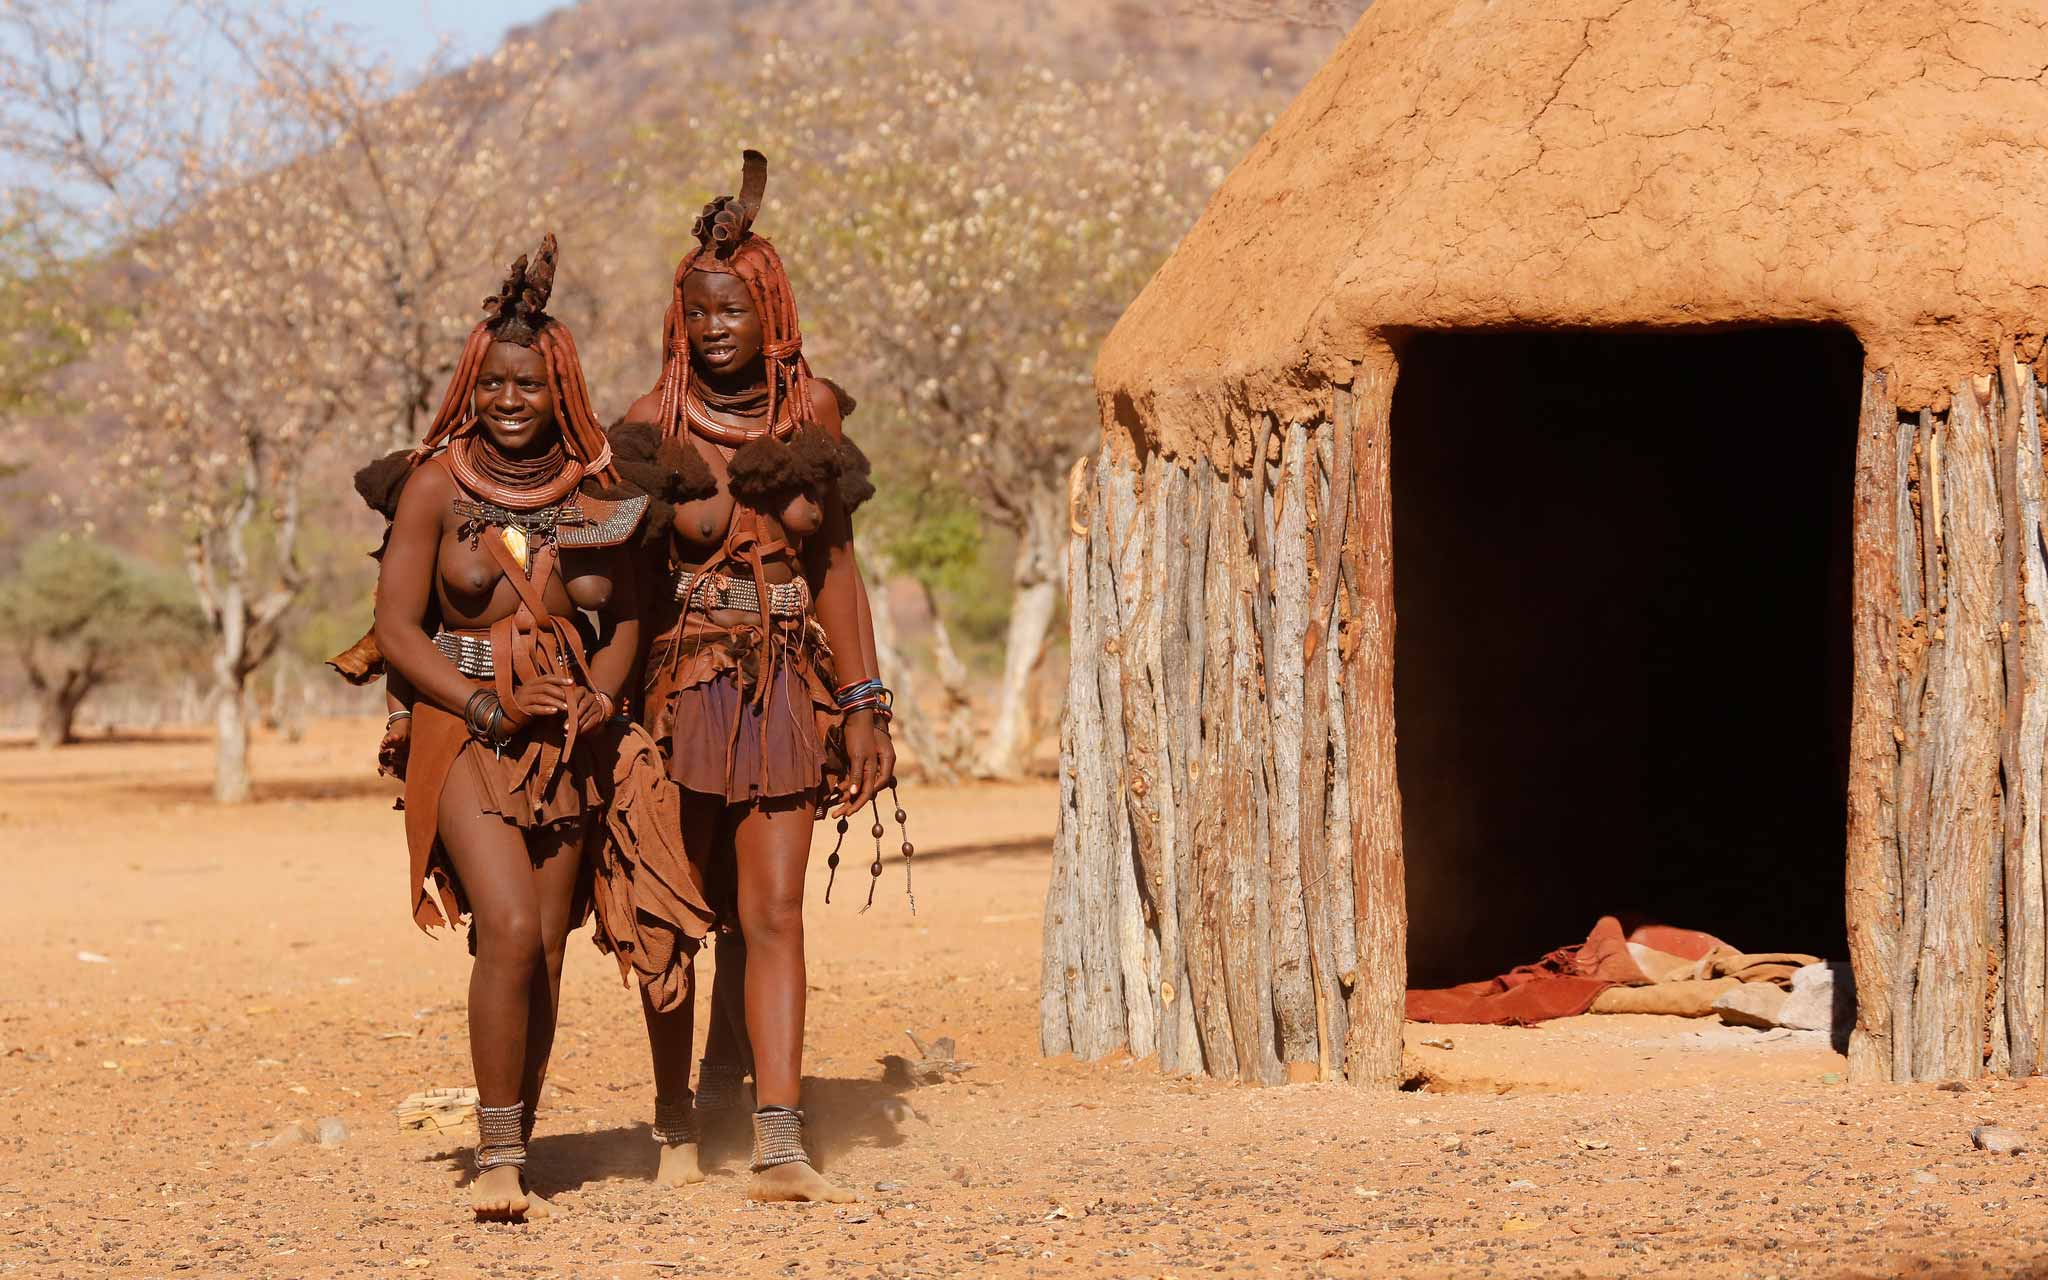 enkosi-africa-safari-namibia-kaokoland-kunene-tourism-board-himba